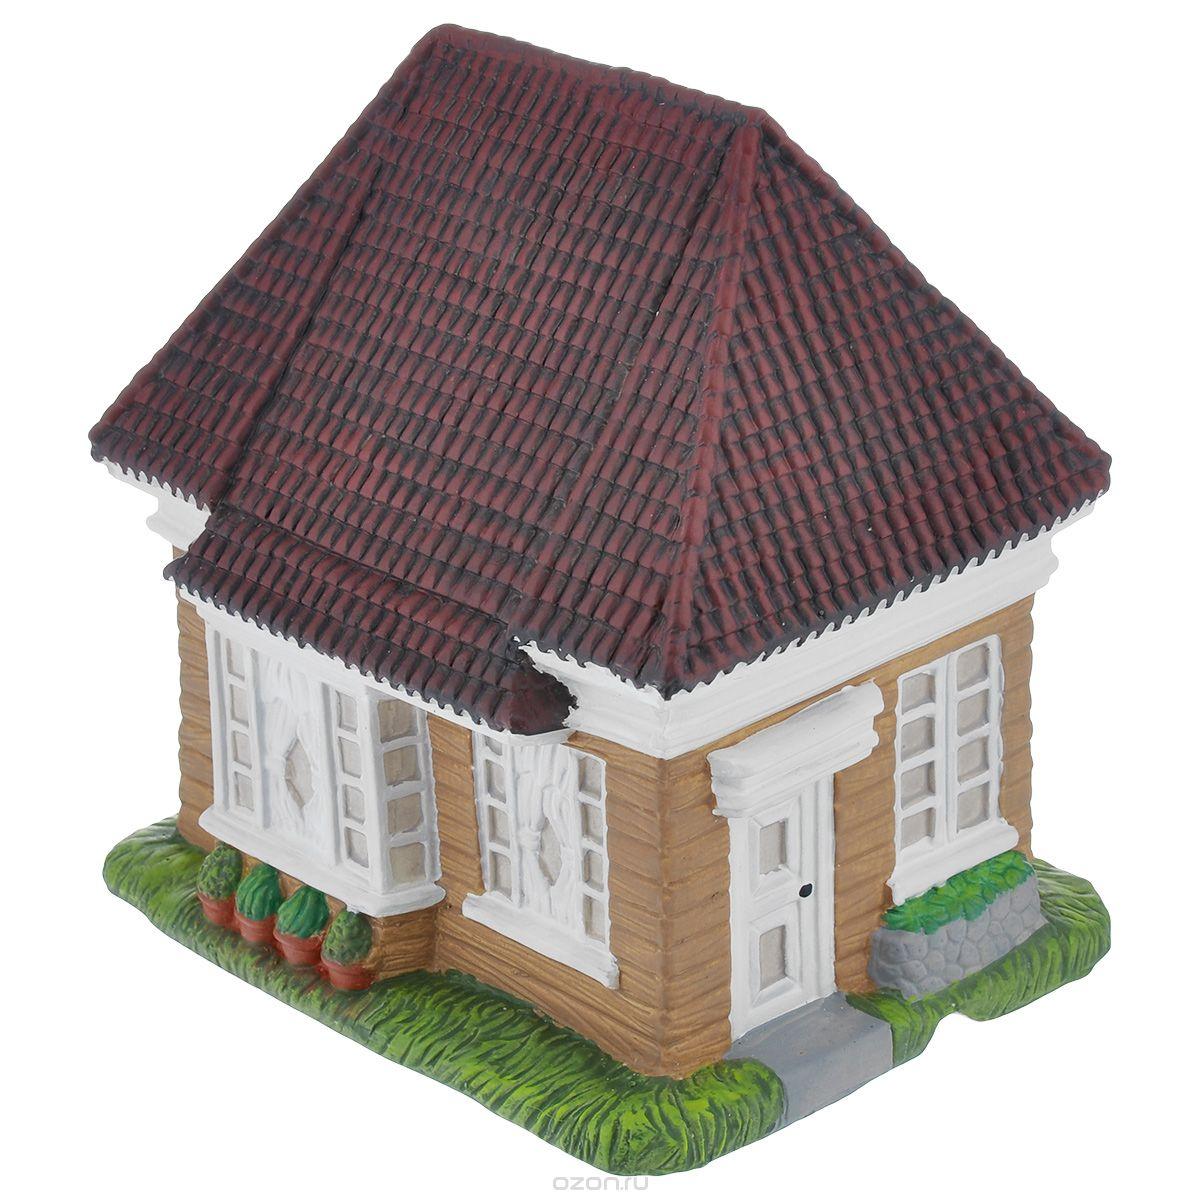 Дом для мини-сада Bloom'its, 18 см х 13,5 см х 20 см мини тренажеры для дома купить